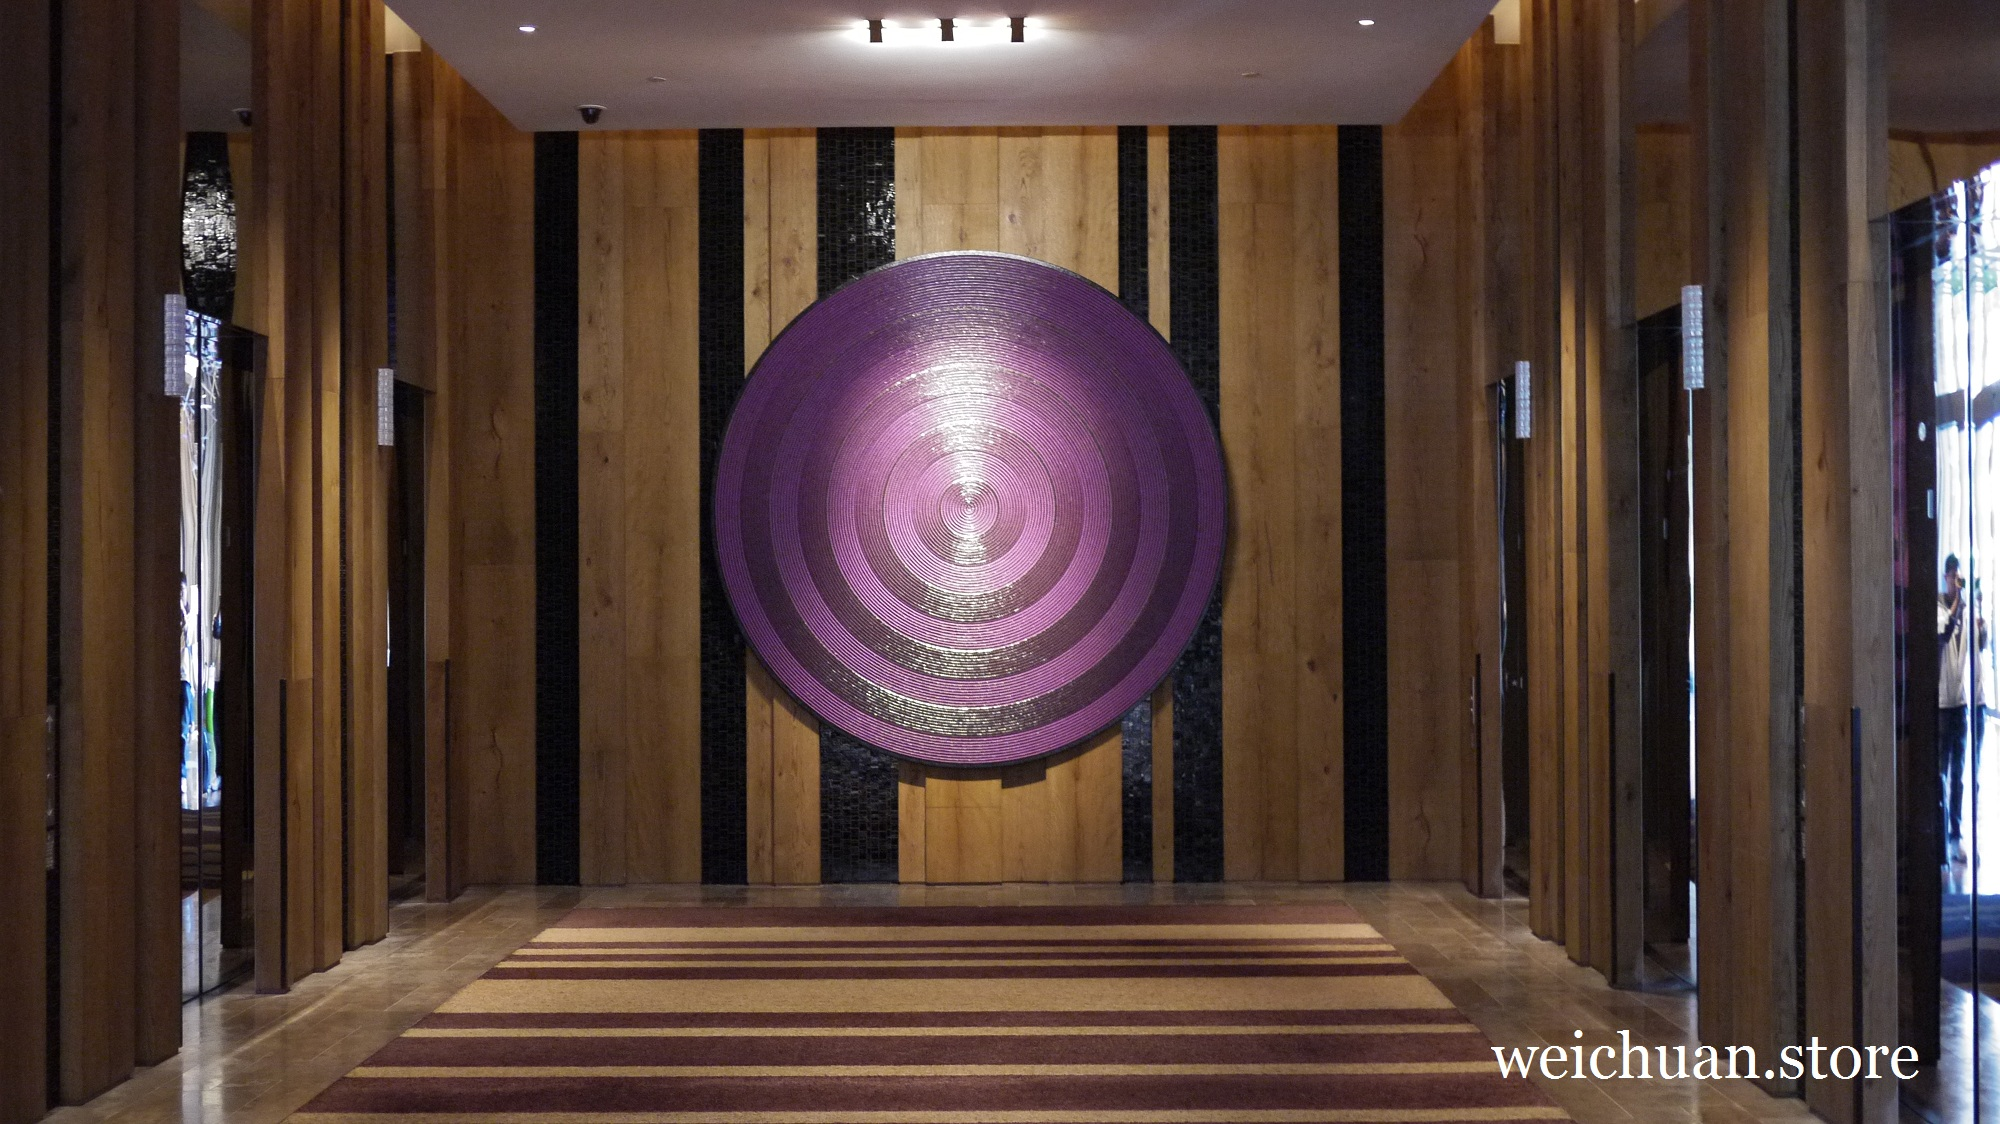 [台北]W Hotel Taipei, Taiwan